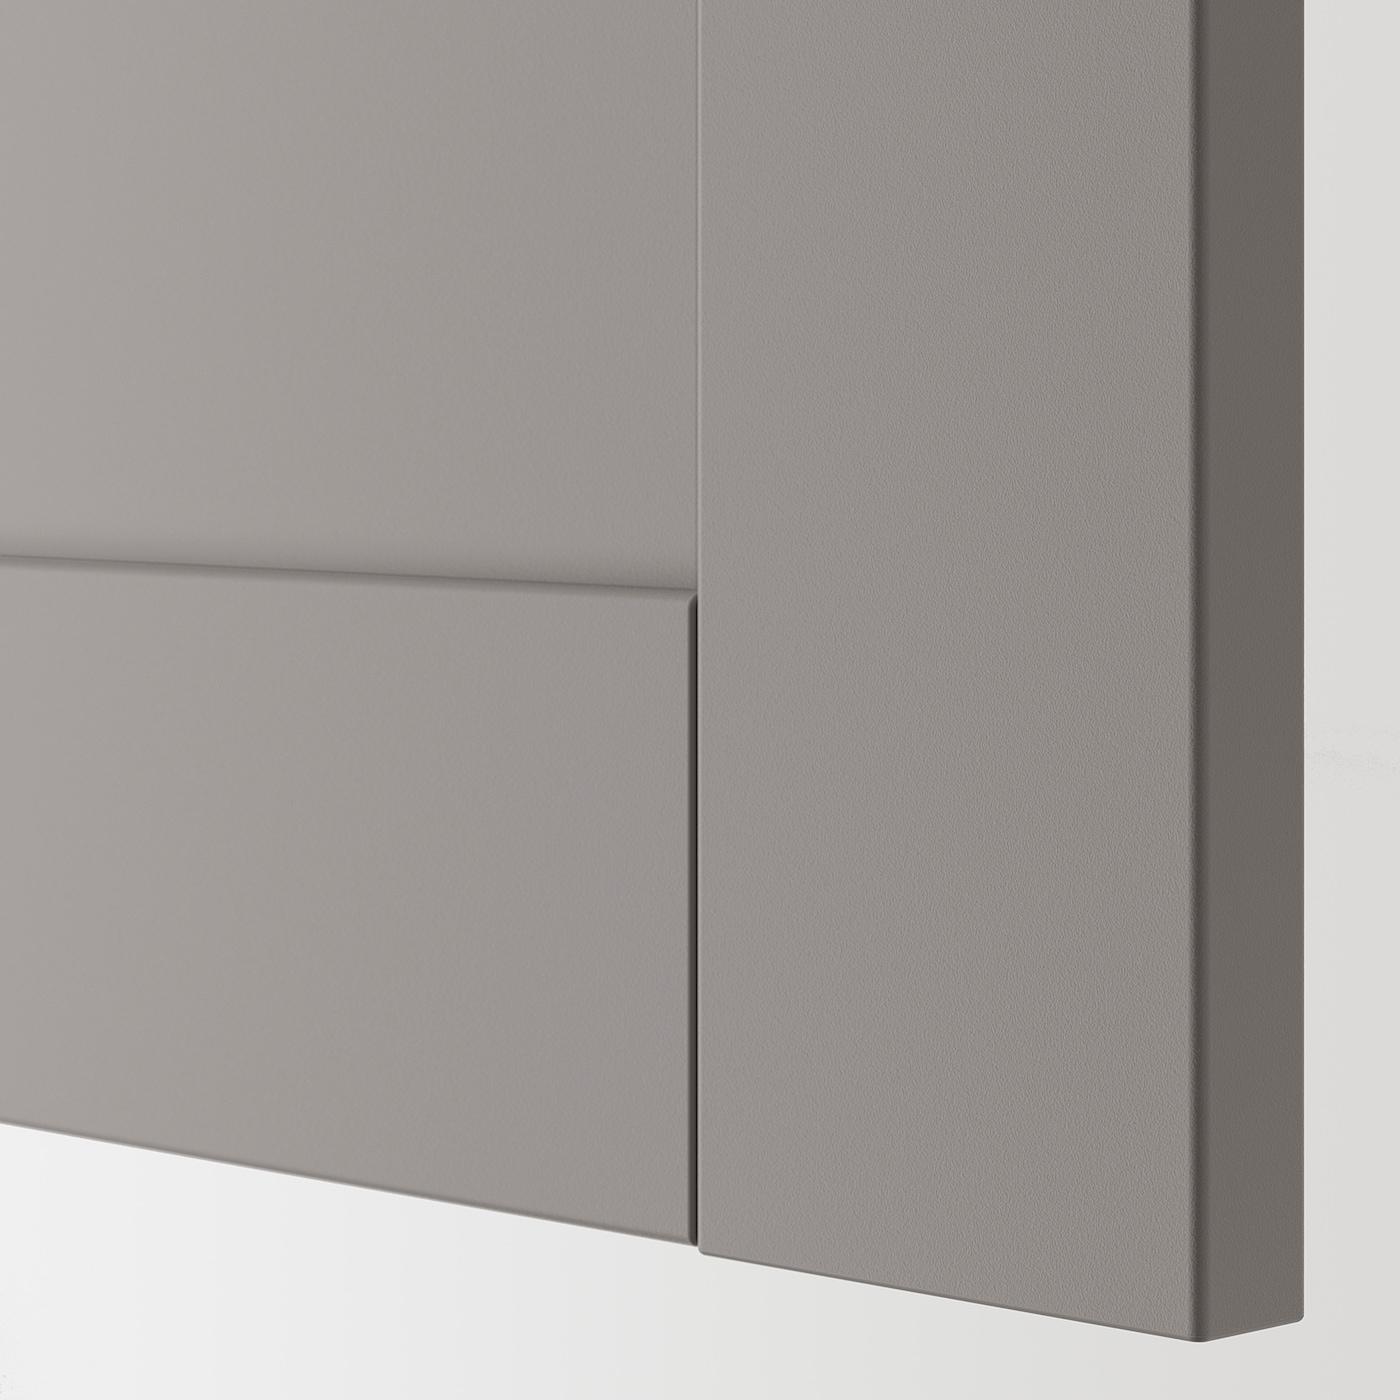 ENHET Onderkast met 3 lades, wit/grijs frame, 60x62x75 cm